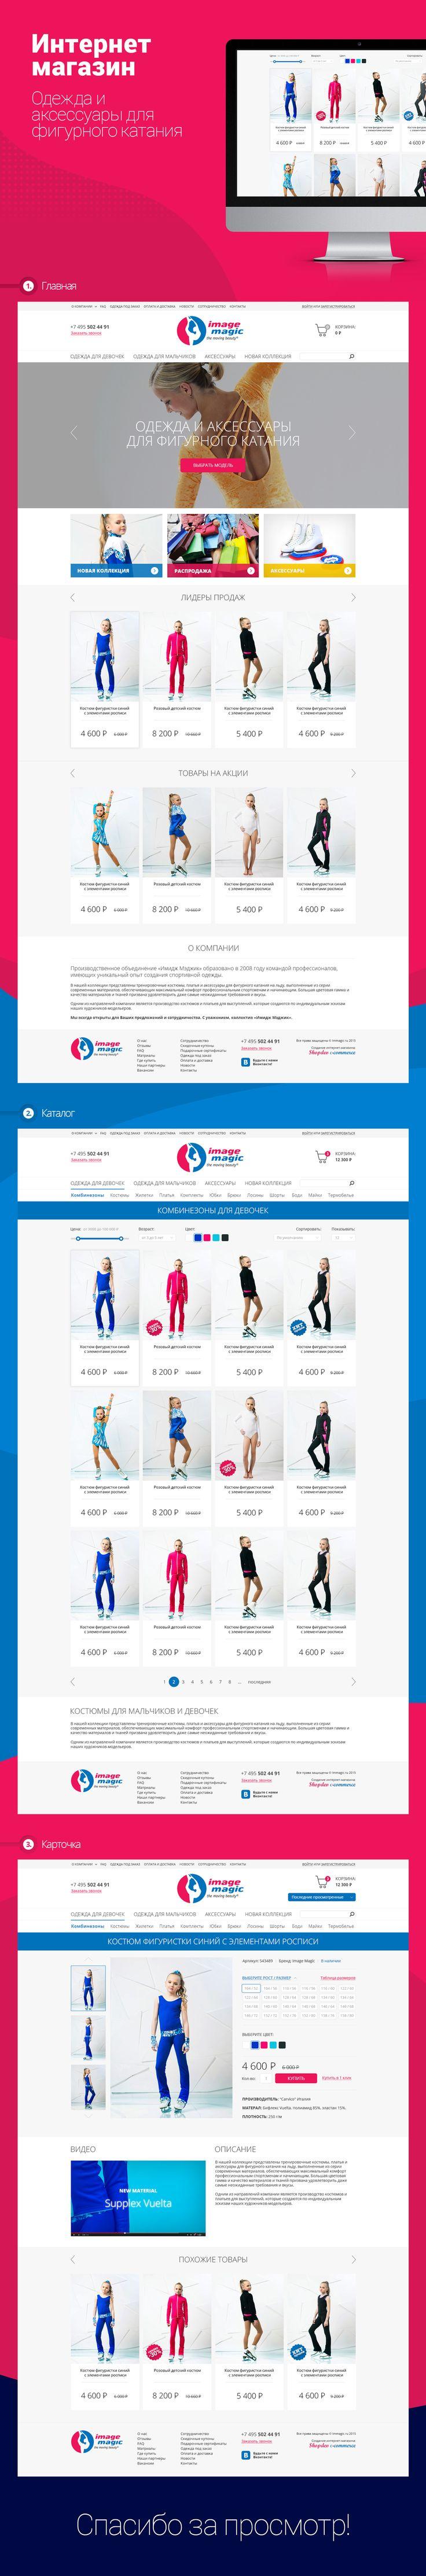 спортивный интернет-магазин, веб дизайн, #shopdev, #opencart, #ecommerce, #опенкарт, #website, #work, #портфолио, #commerce, #коммерция, #market, #onlineshop, #cart, #shop, #store, #адаптивный, #adaptivedesign, #дизайн, #вебдизайн, #интернетмагазин, #онлайнмагазин, #UI, #UX, #webdesign, #webdevelopment.